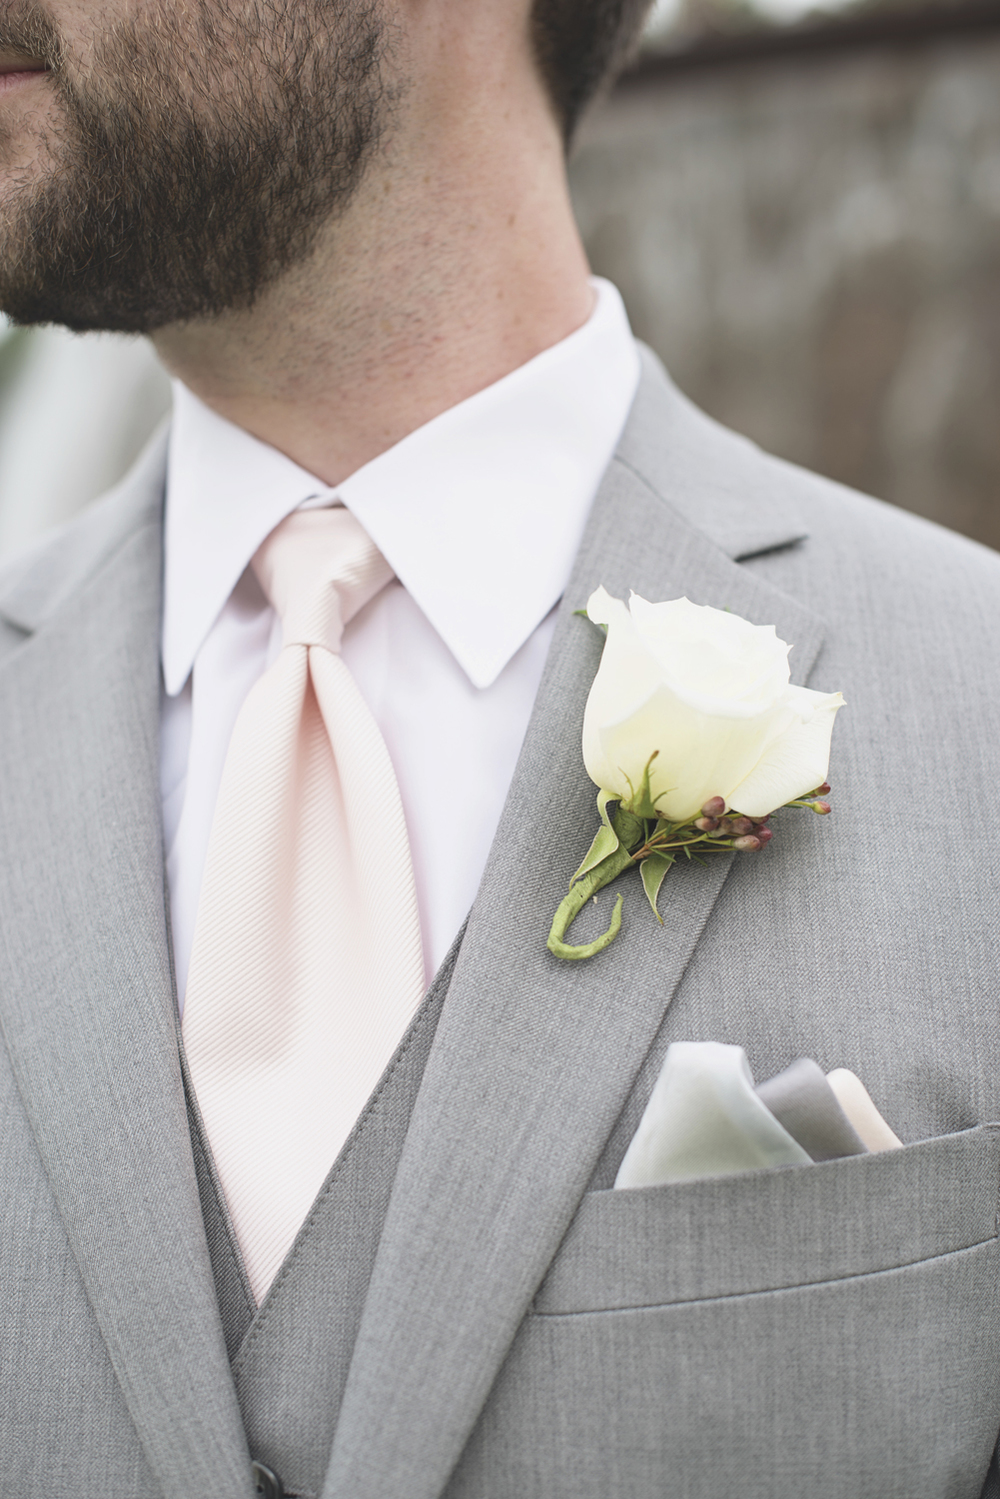 Trump National Golf Club Wedding | Washington, DC Wedding | White rose boutonniere